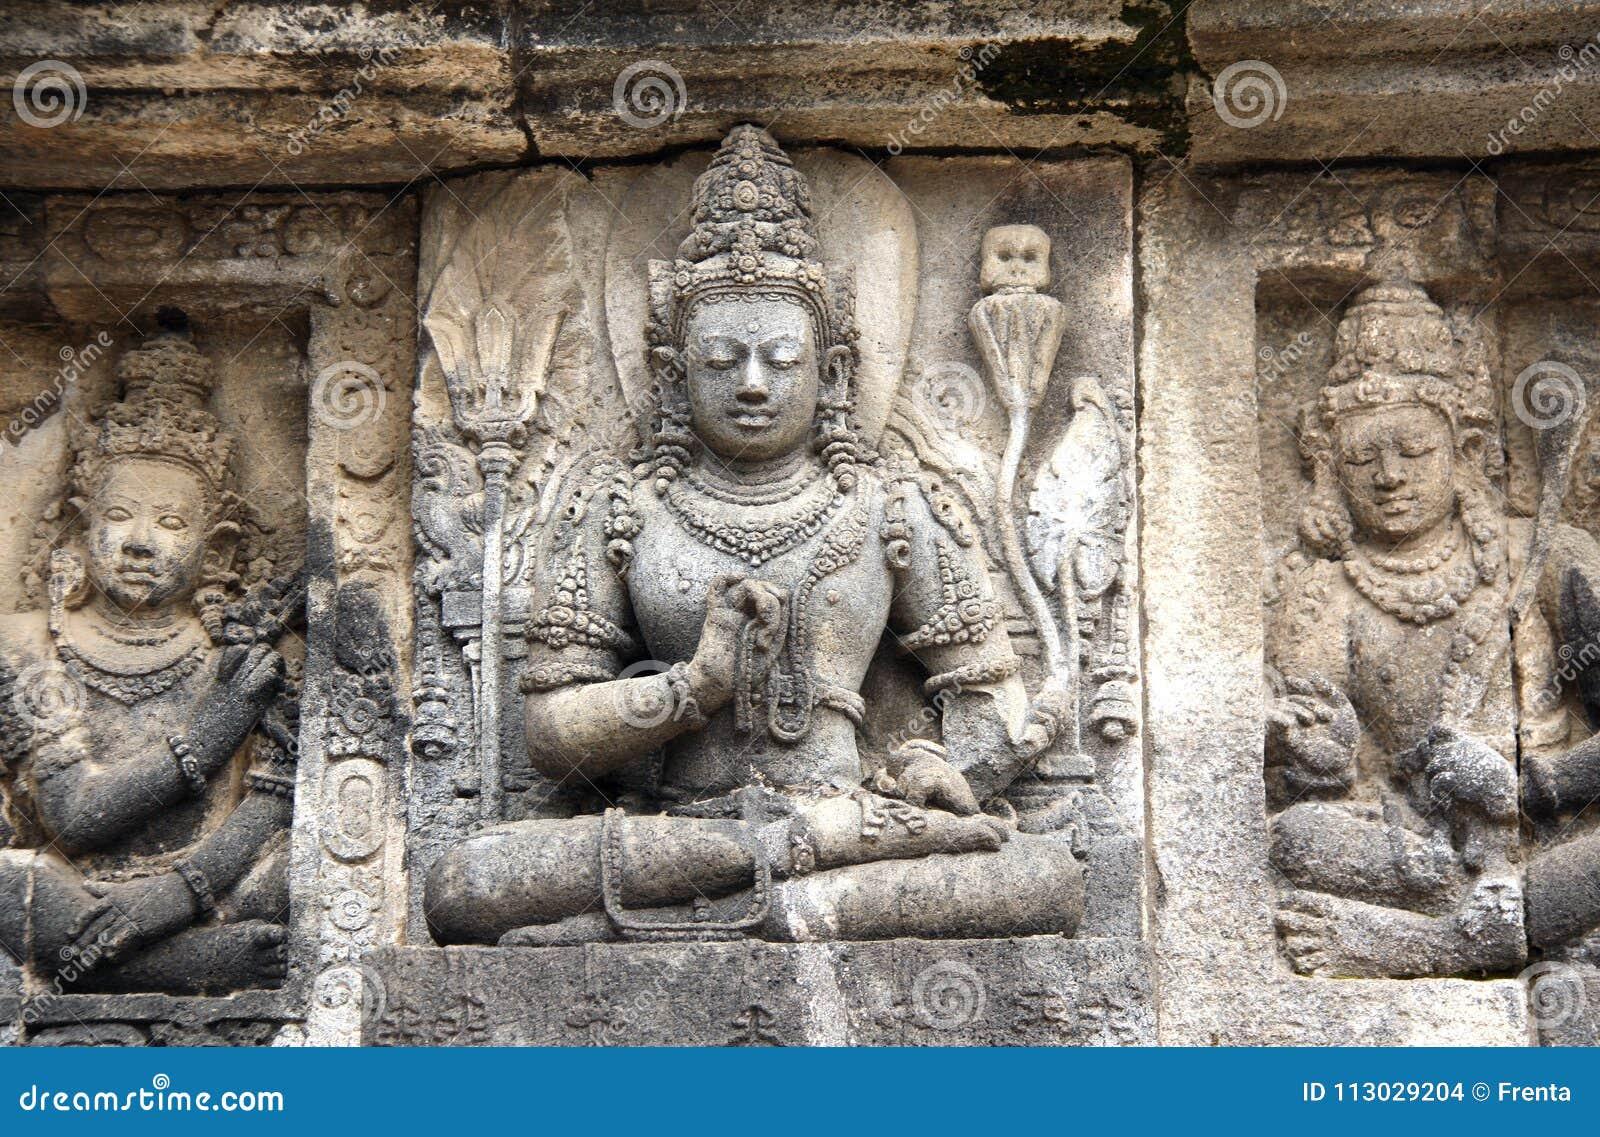 Bajorrelieve de meditar a Buda, Prambanan, Yogyakarta, Java, adentro